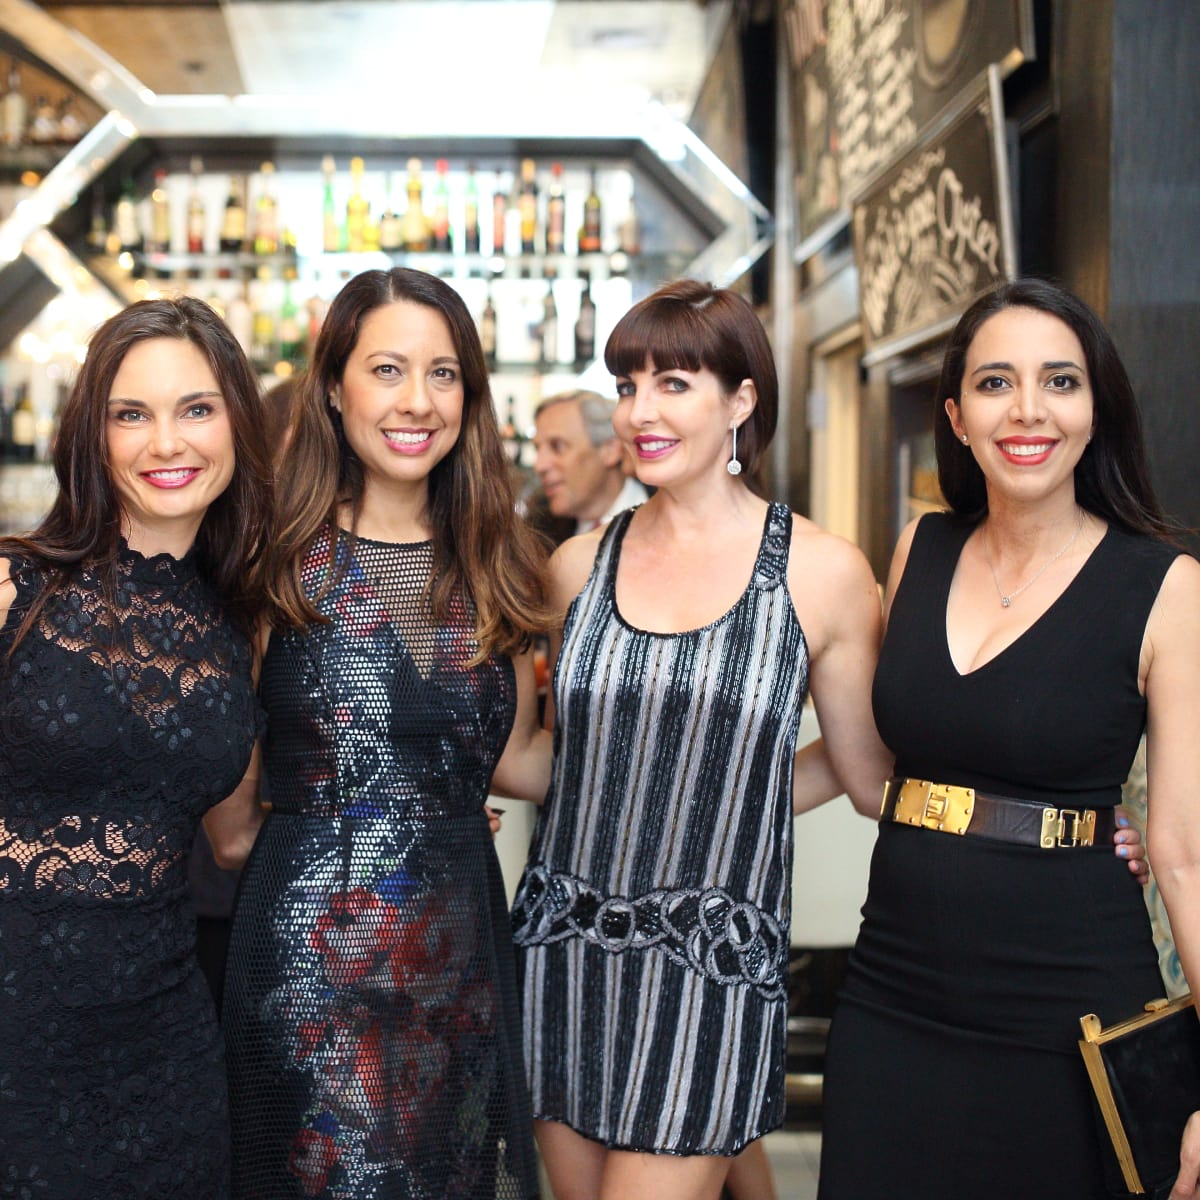 Dine Out for Life 4/16, Amanda Russel, Anika Jackson, Staci Henderson, Dr. Sanaz Harirchian